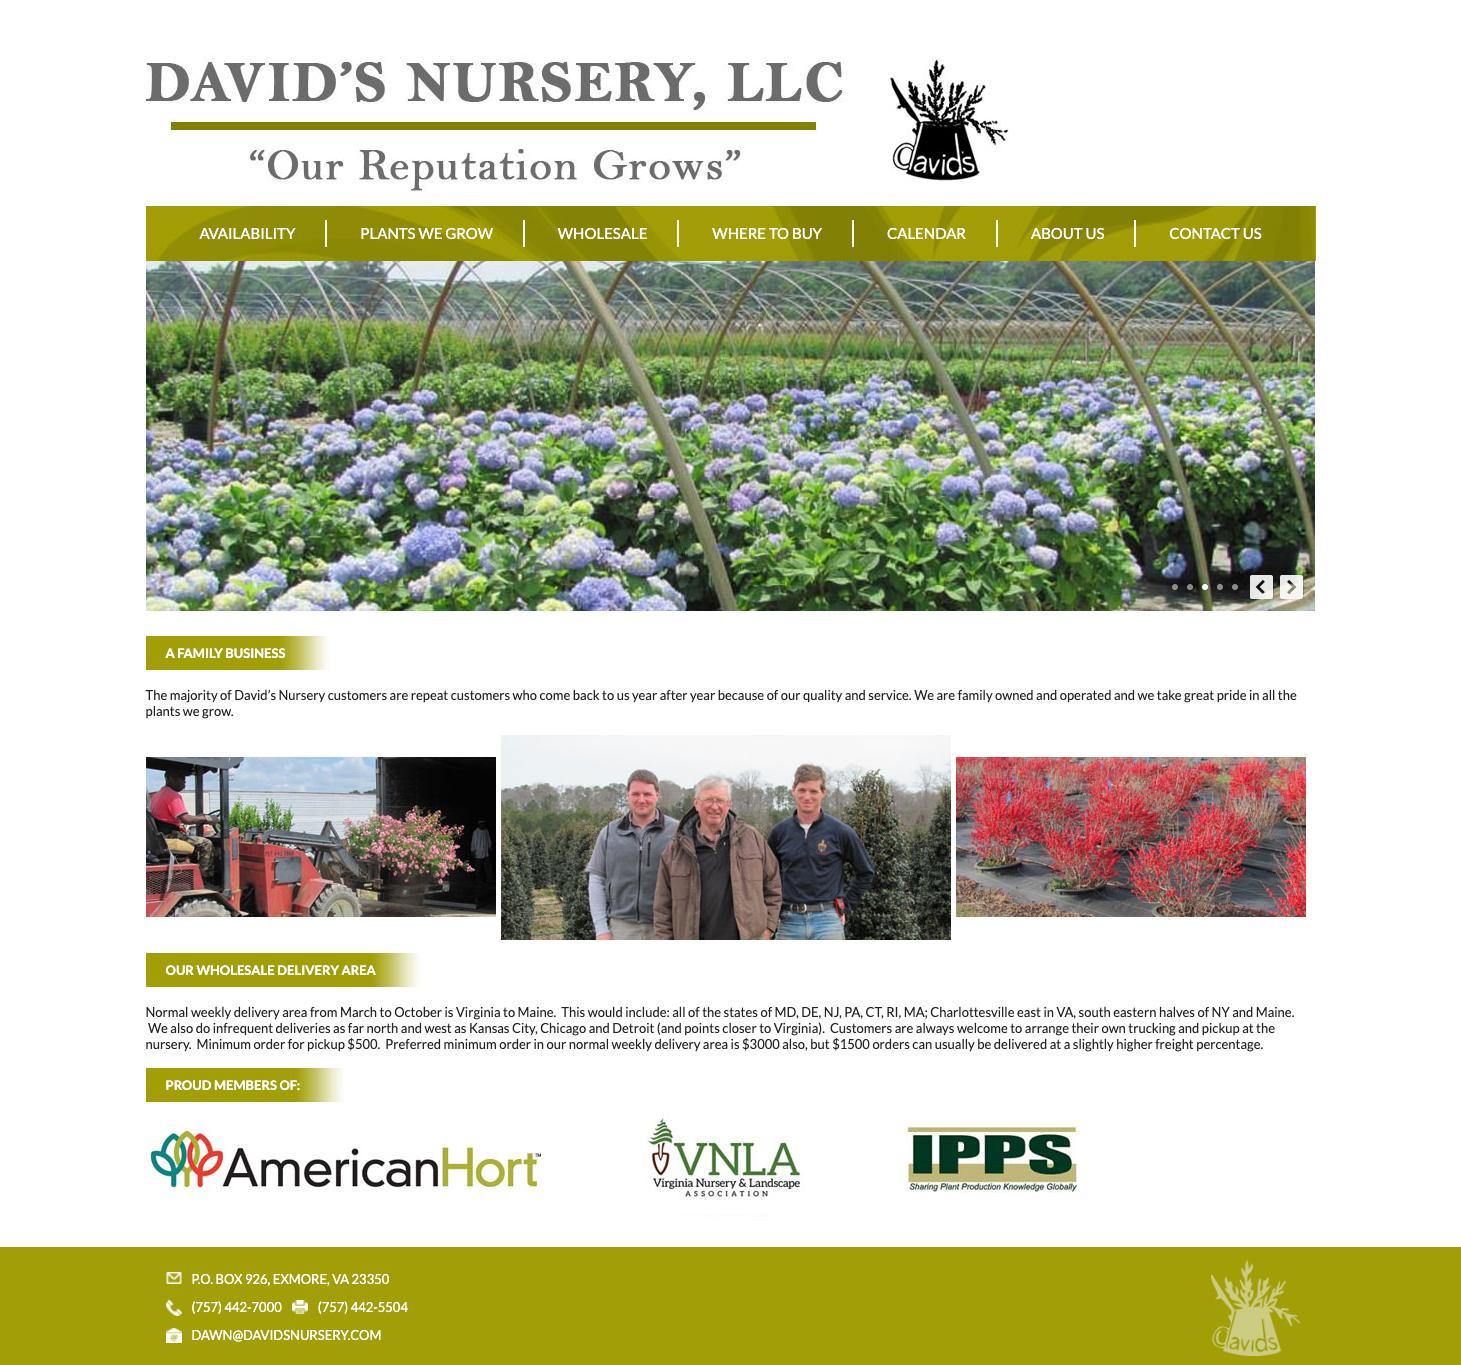 DavidsNursery_WebDesign2.png